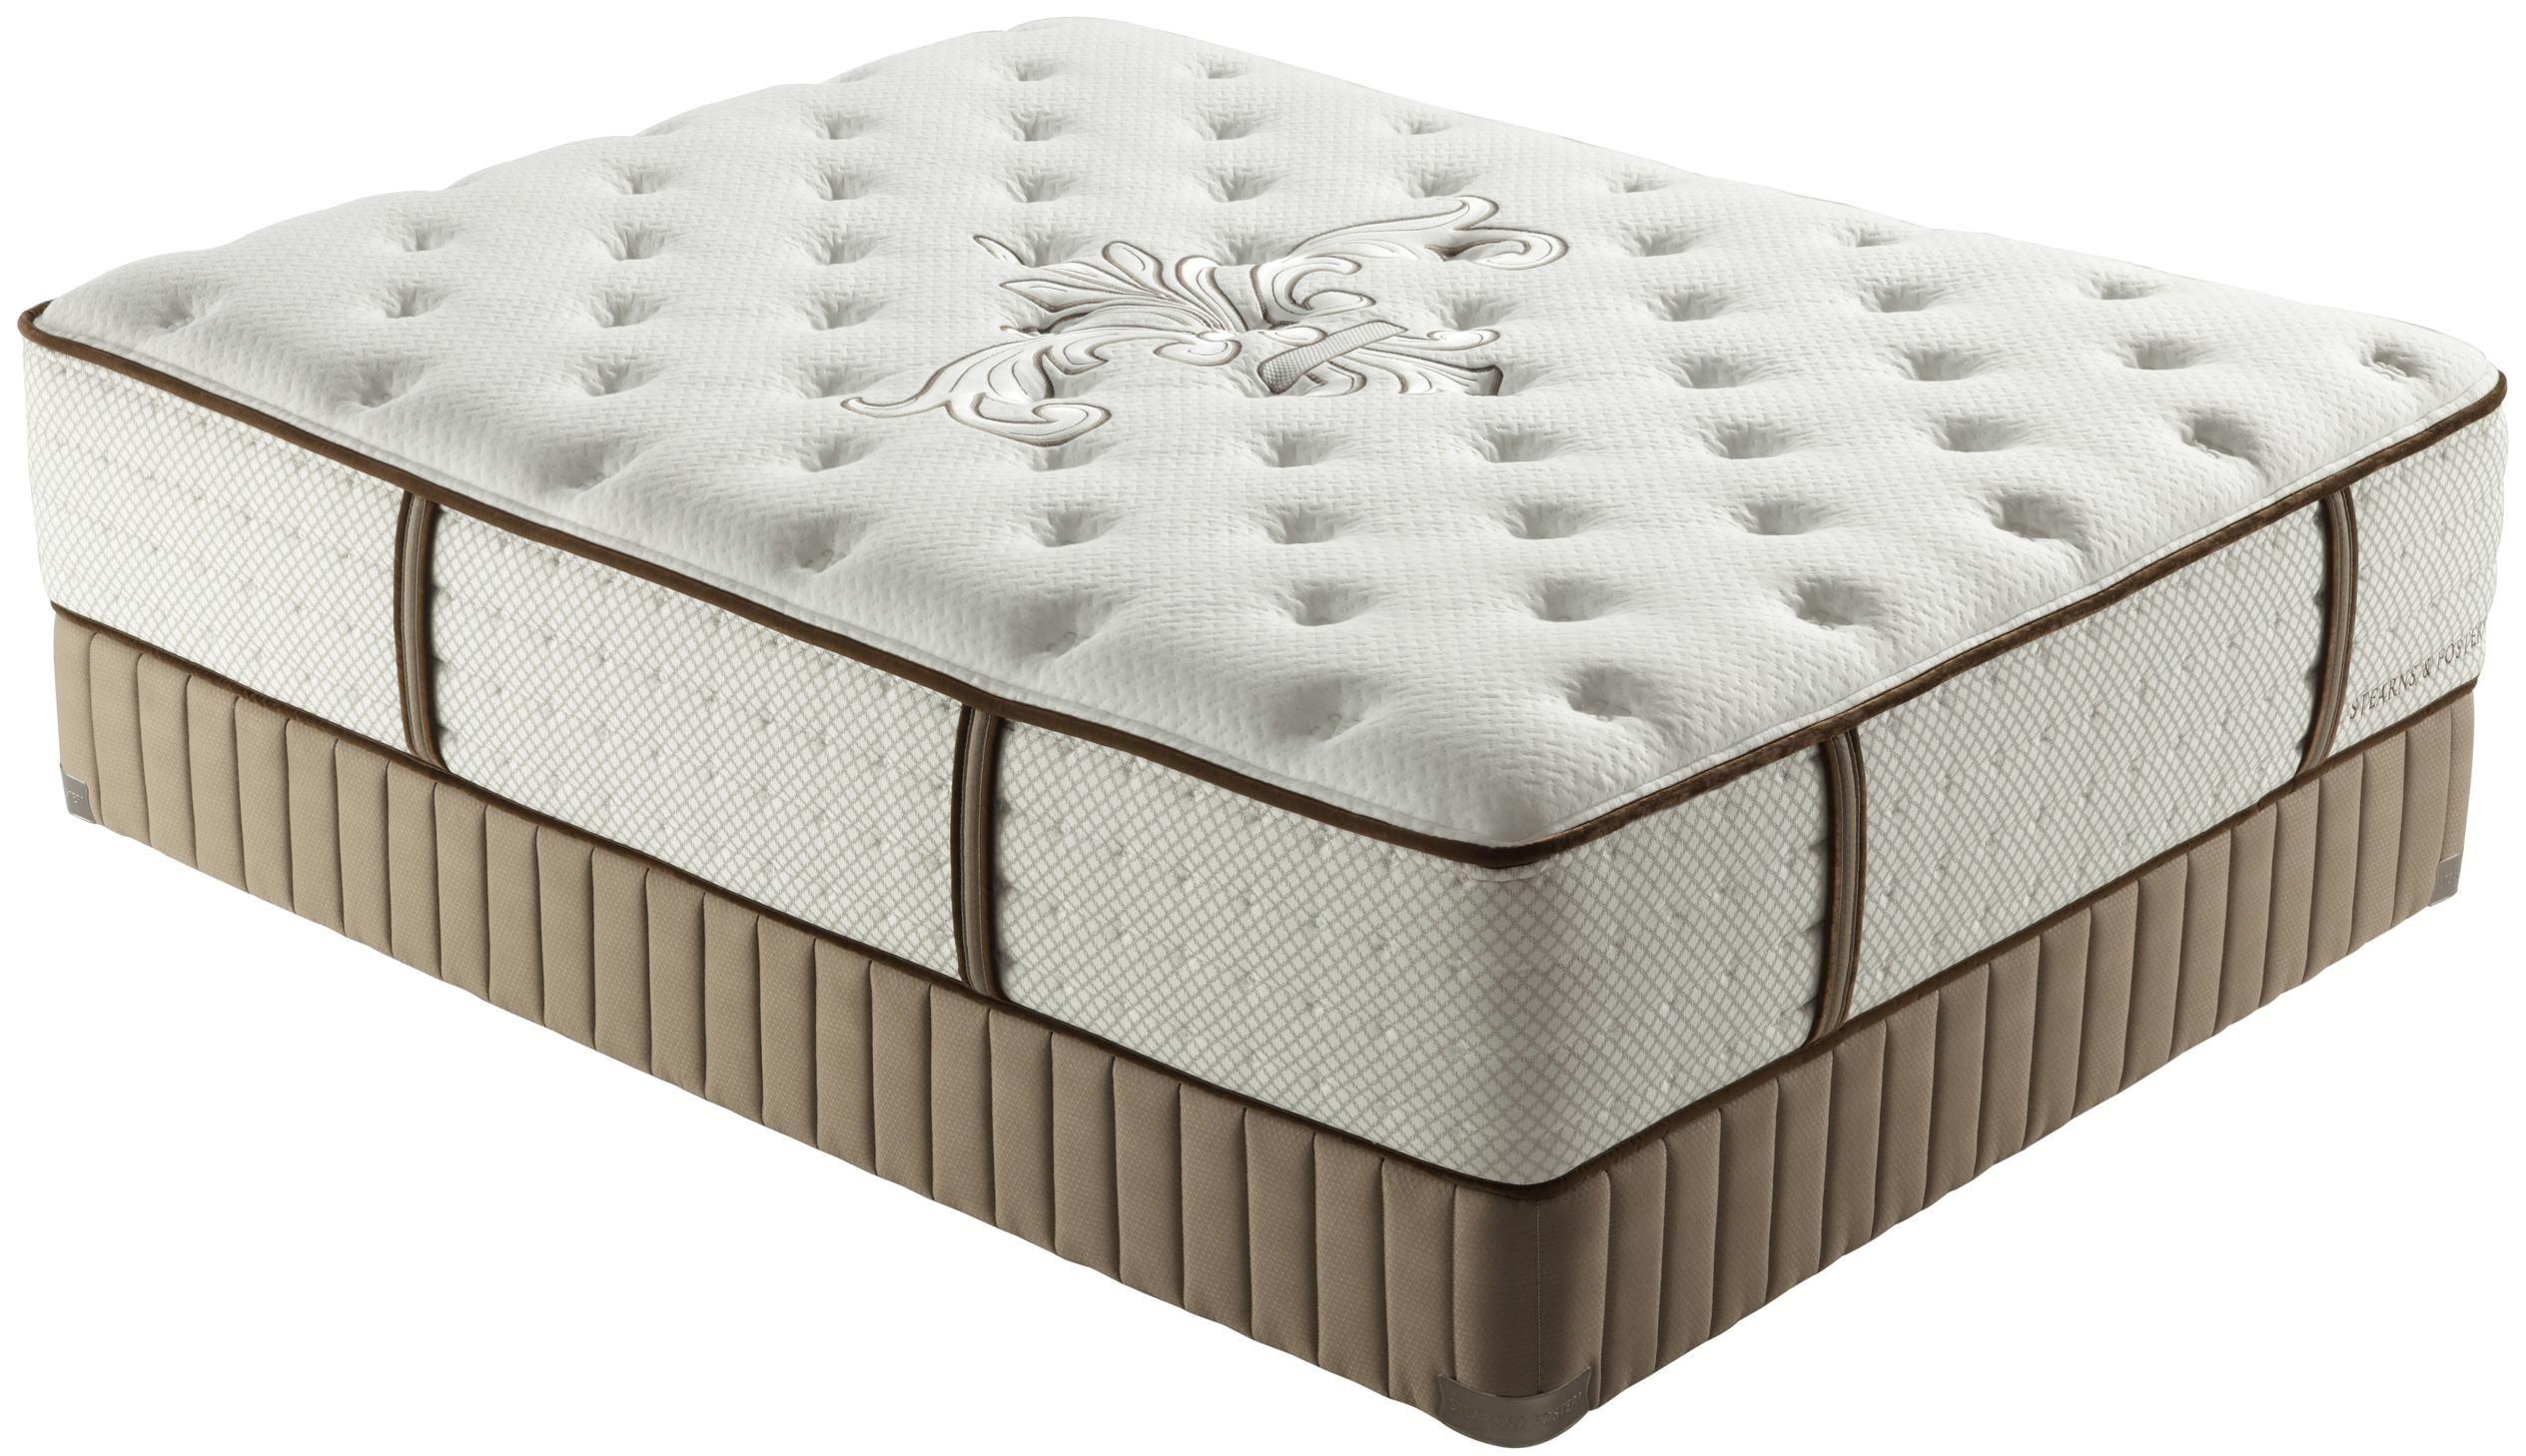 Lux Estate Patrice King Luxury Firm Mattress Set By Stearns Mattress Furniture Mattress Mattress Sales